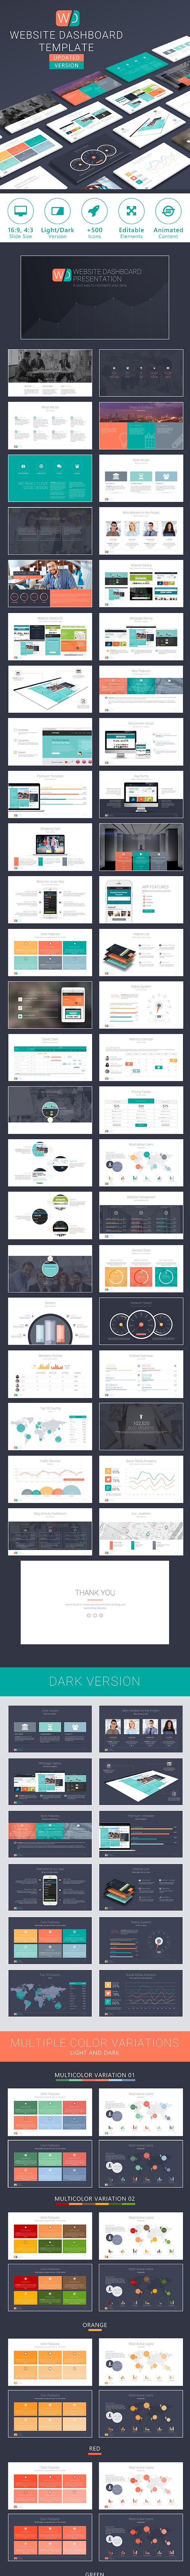 Website Dashboard Presentation Template - Creative PowerPoint Templates